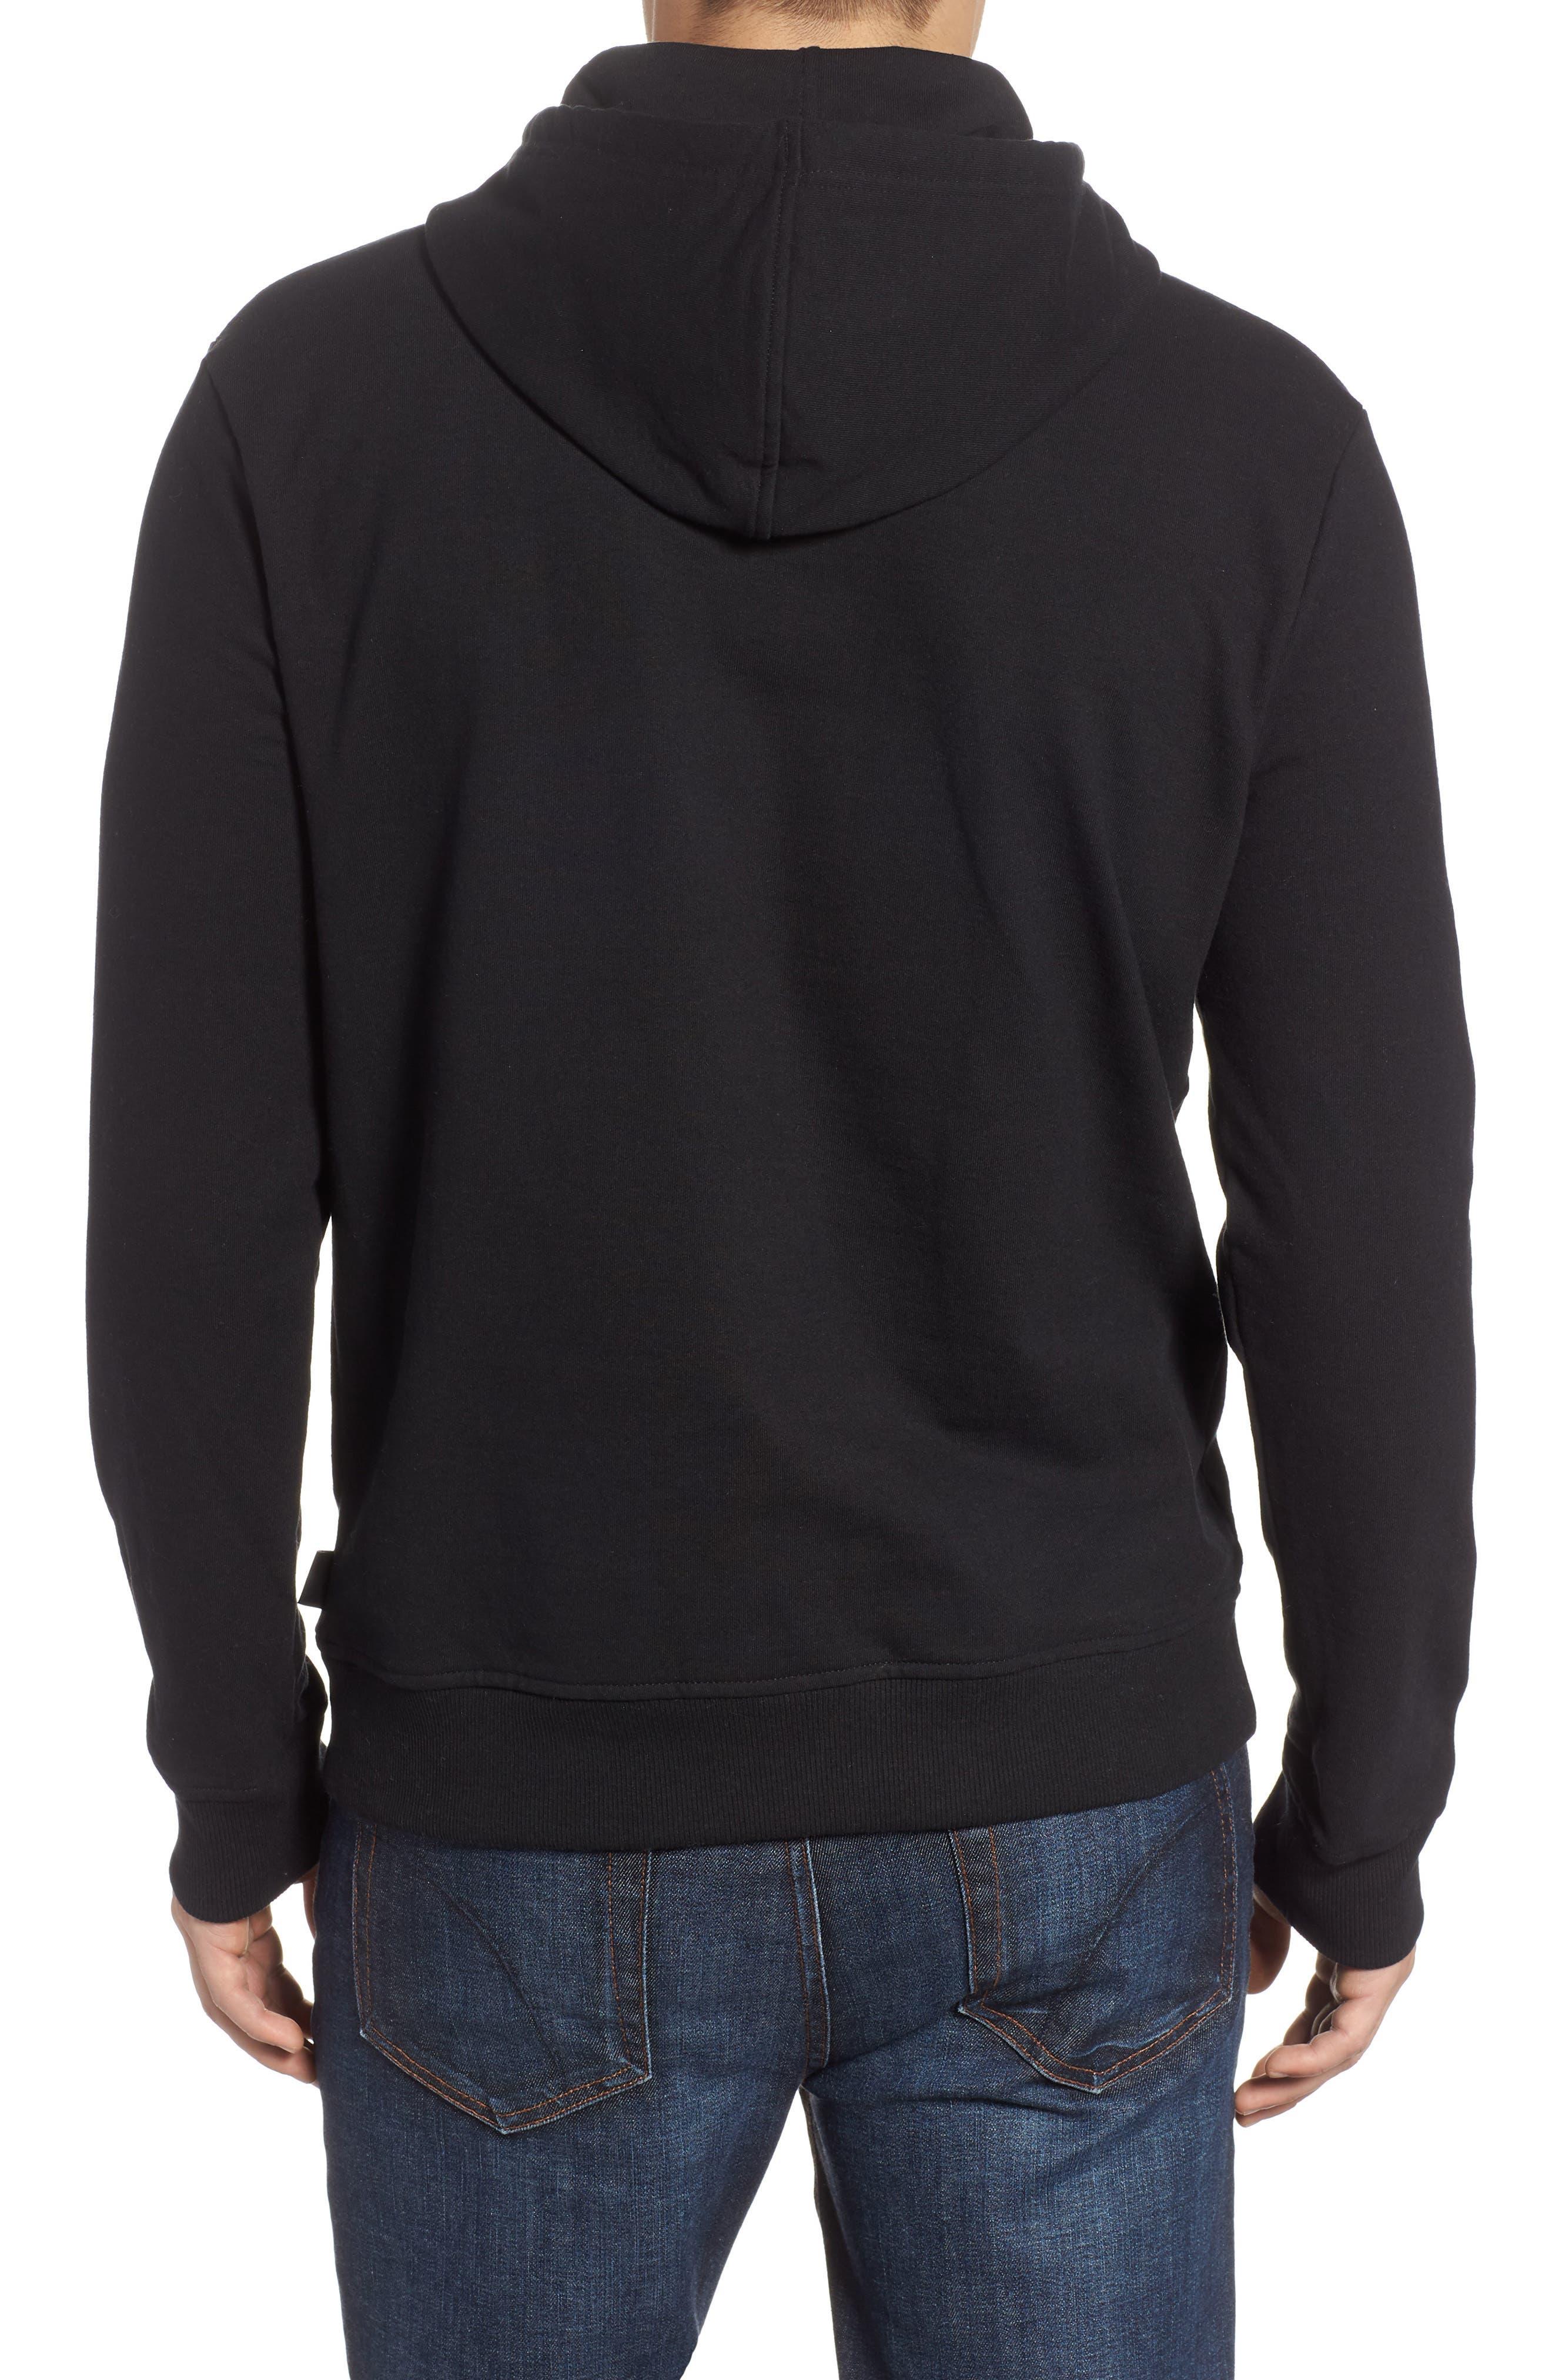 PATAGONIA, P6 Logo Uprisal Hooded Sweatshirt, Alternate thumbnail 2, color, BLACK